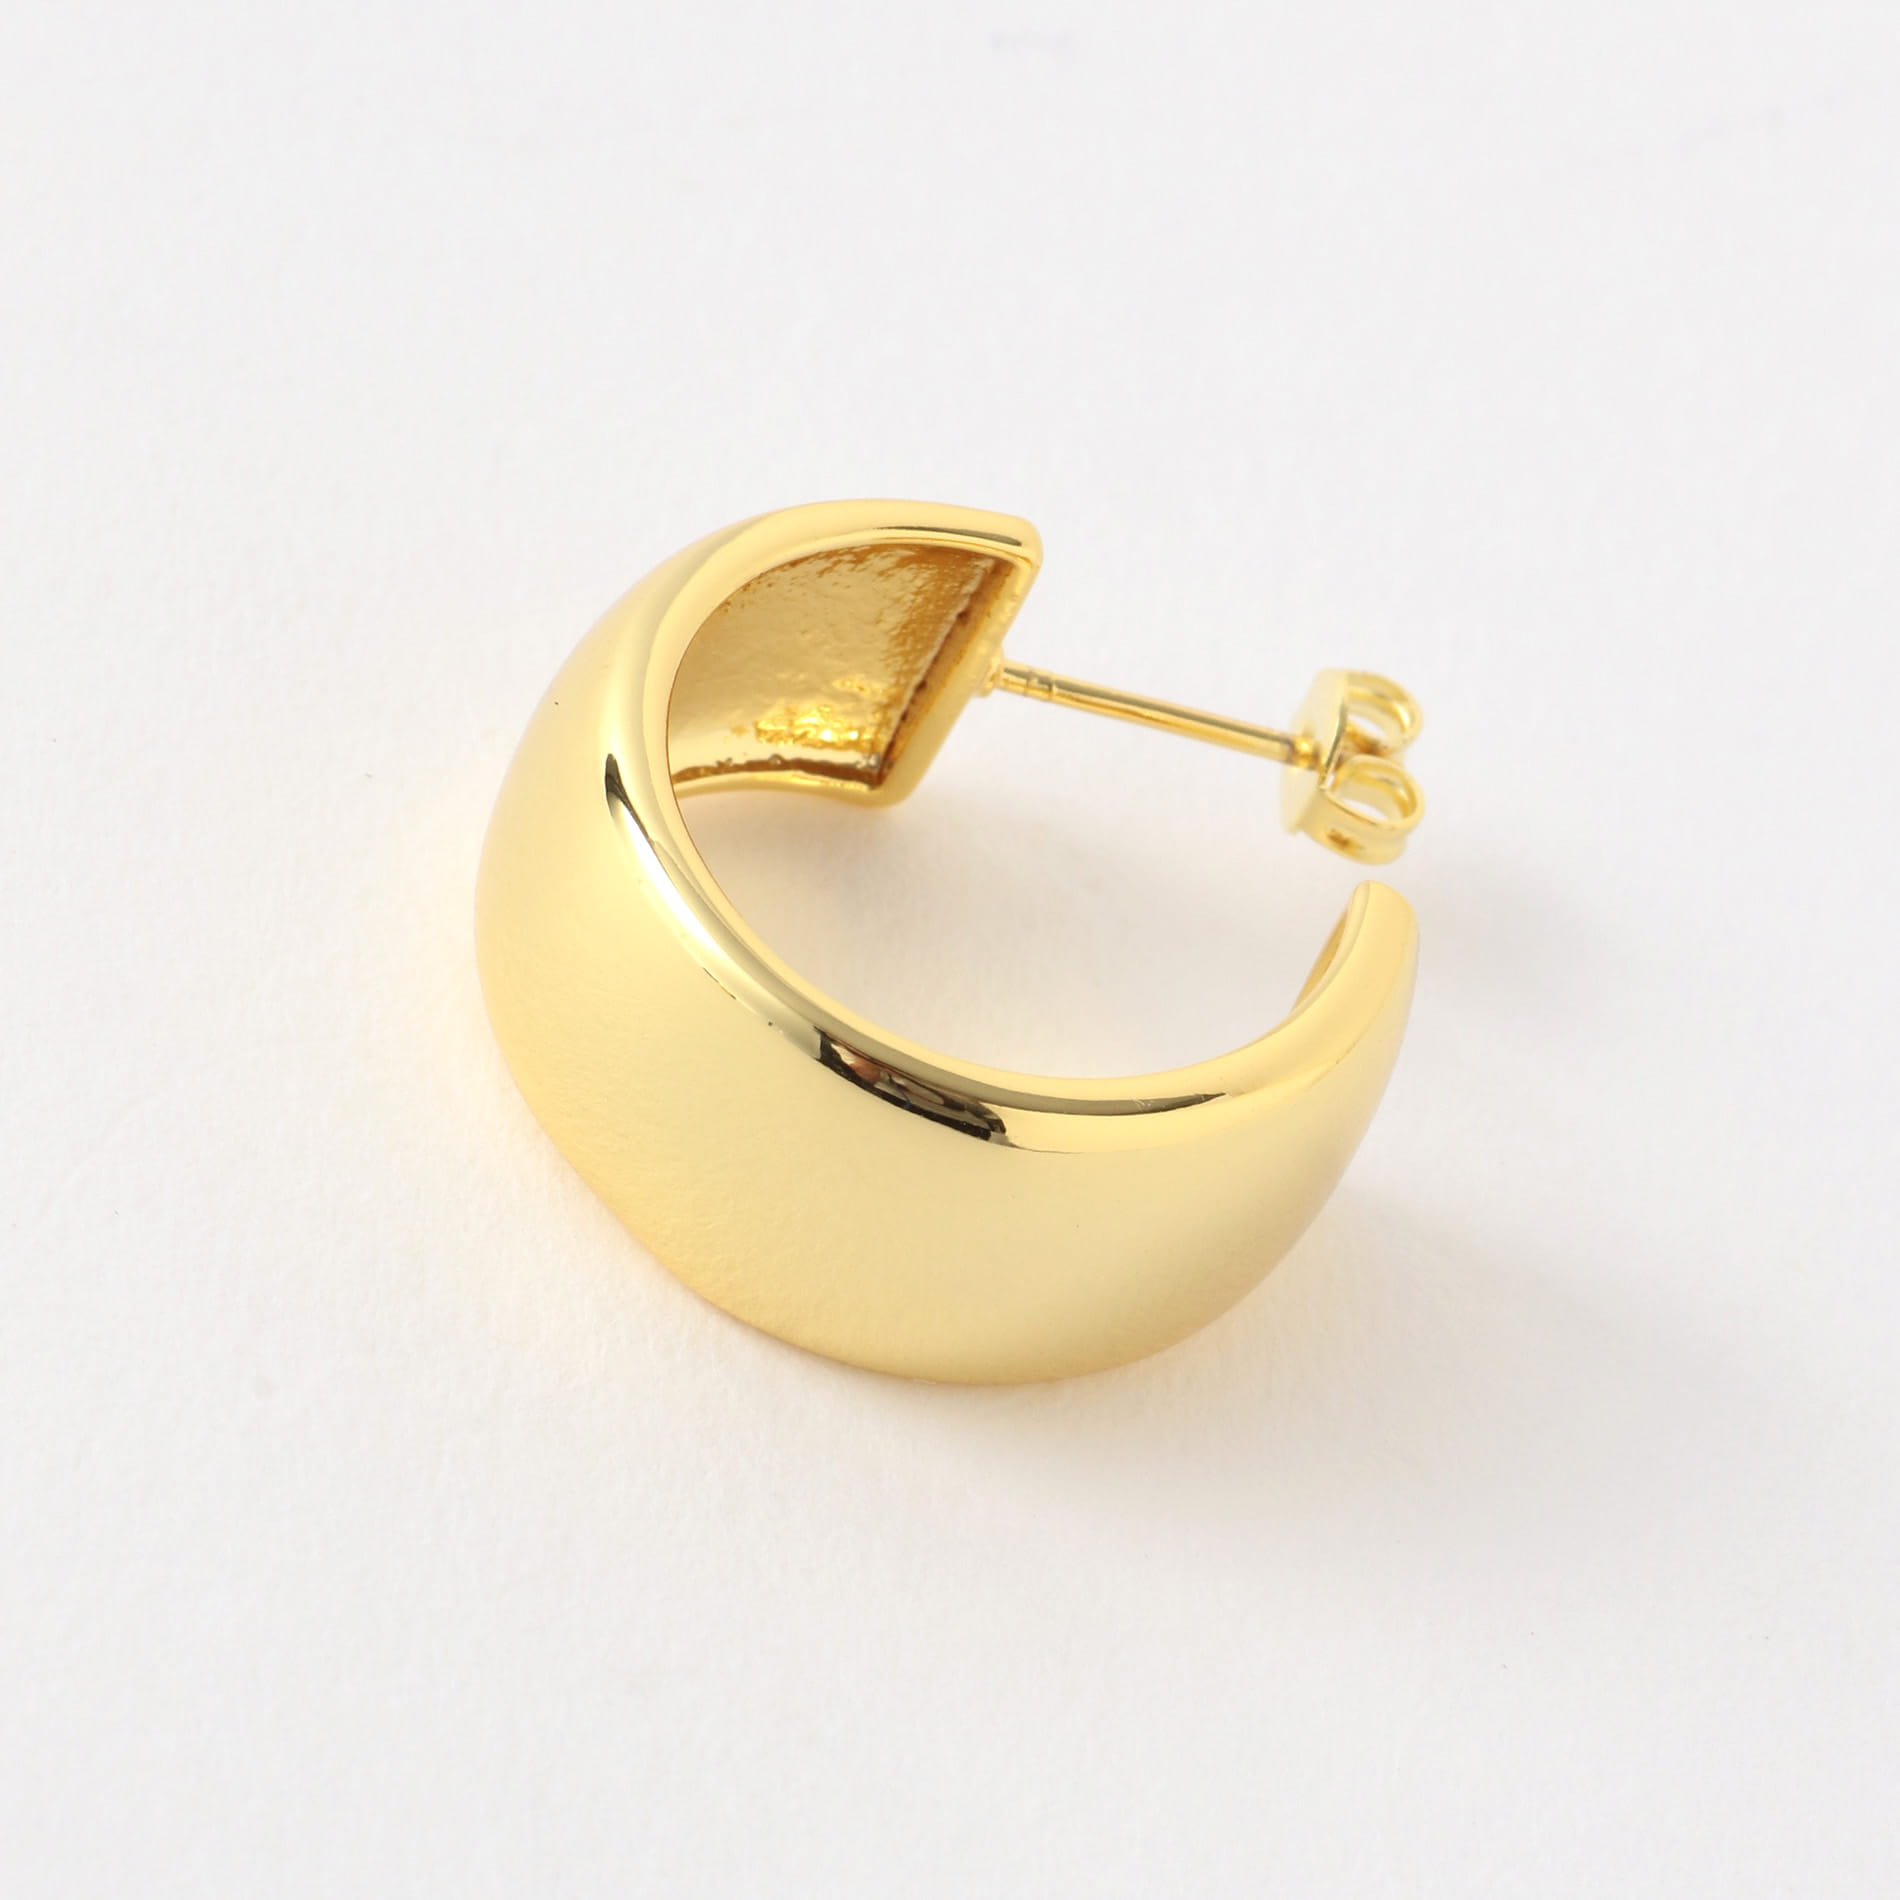 【MOYA】WOMEN ピアス GIORGIA HOOP EARRINGS 14CT GOLD PLATEDBRASS MOYA001GP